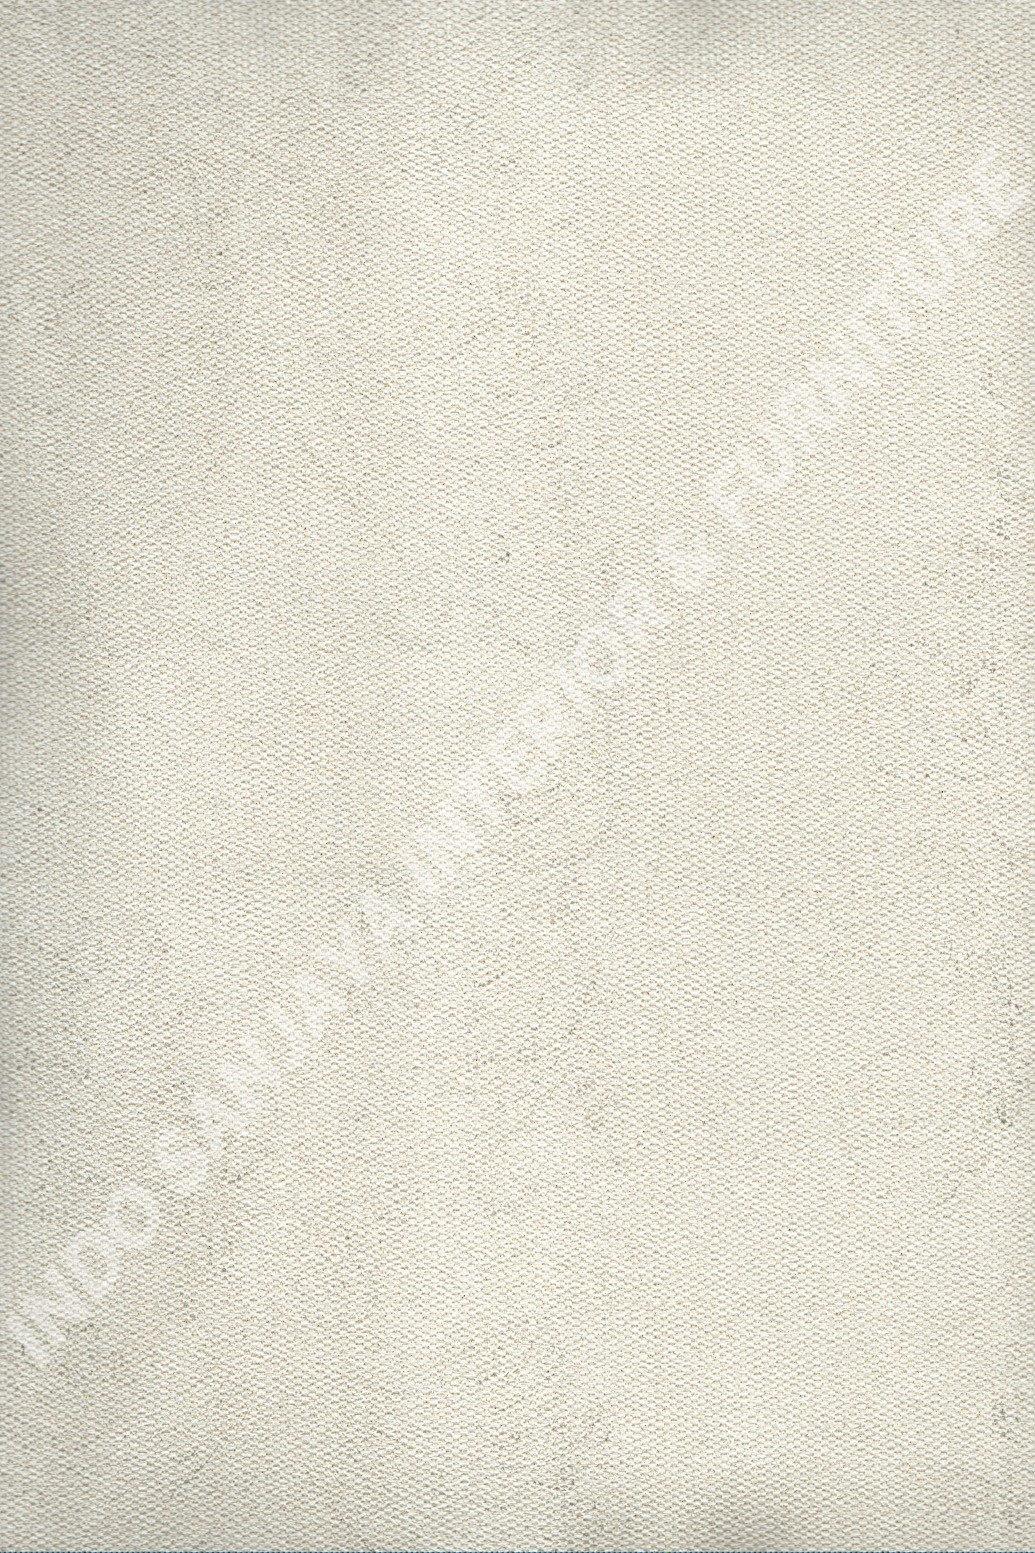 wallpaper   Wallpaper Minimalis Polos 87031:87031 corak  warna